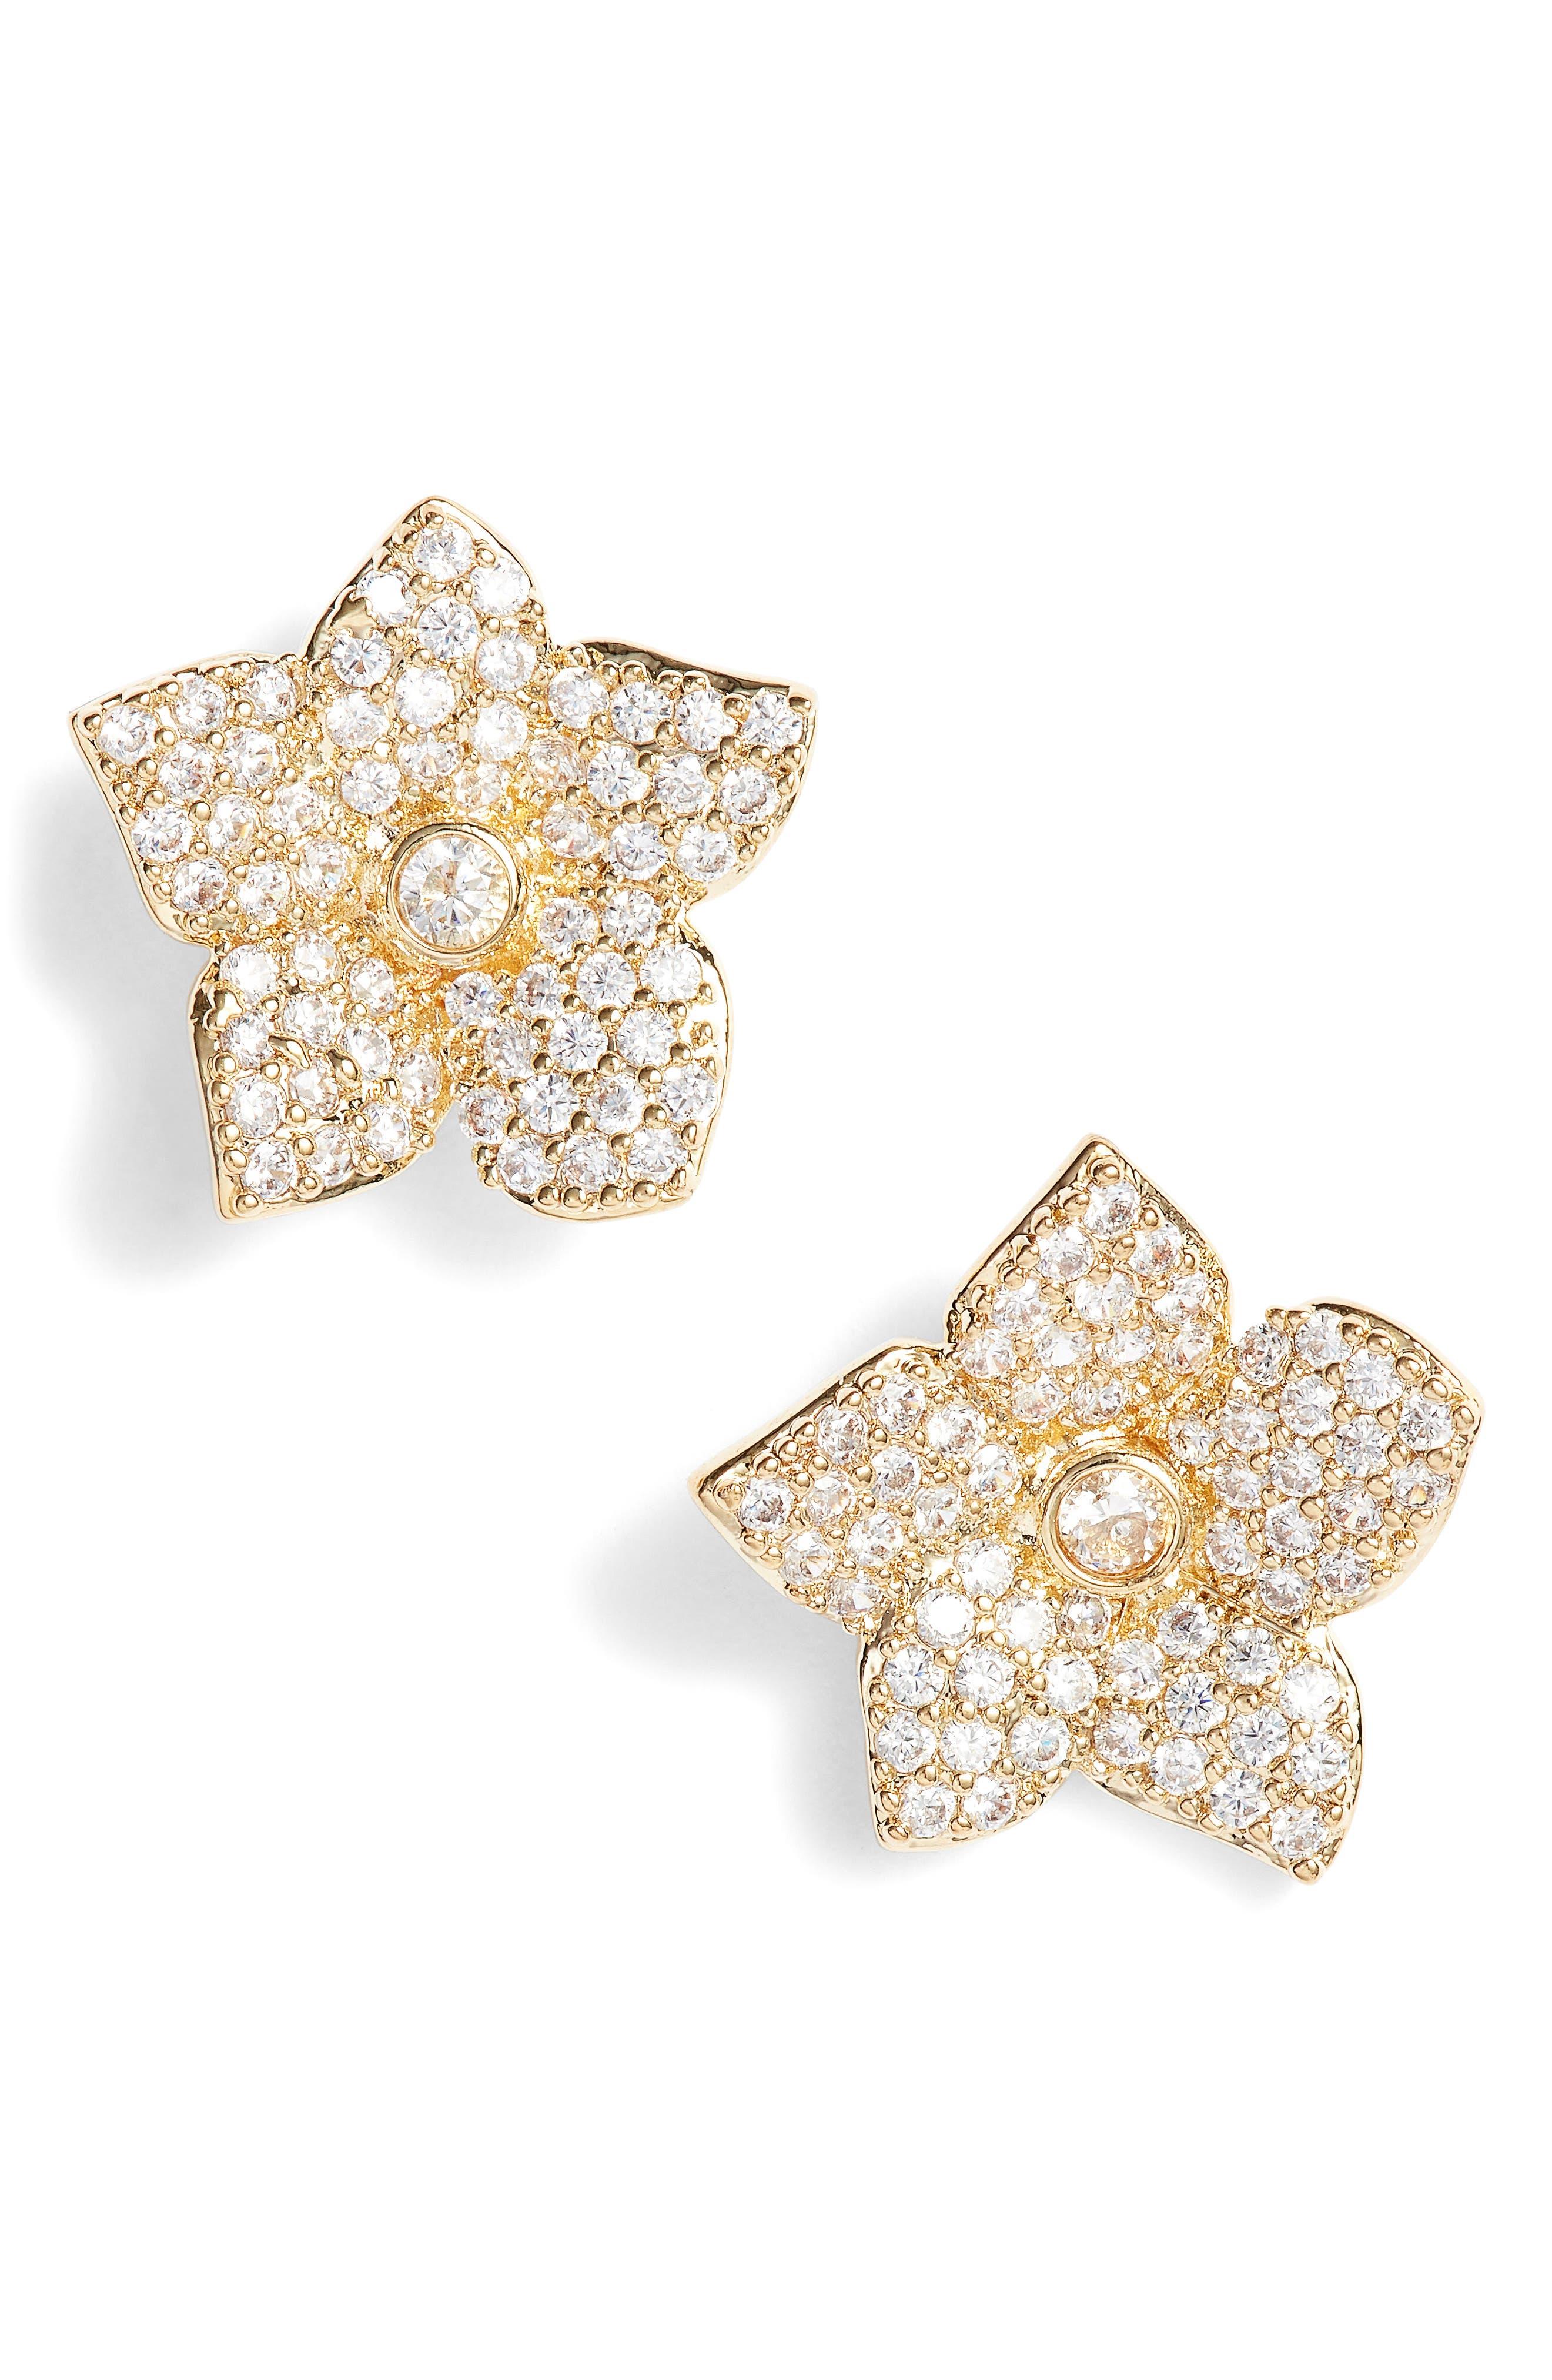 Kate Spade Blooming Pavé Stud Earrings,                         Main,                         color, Gold